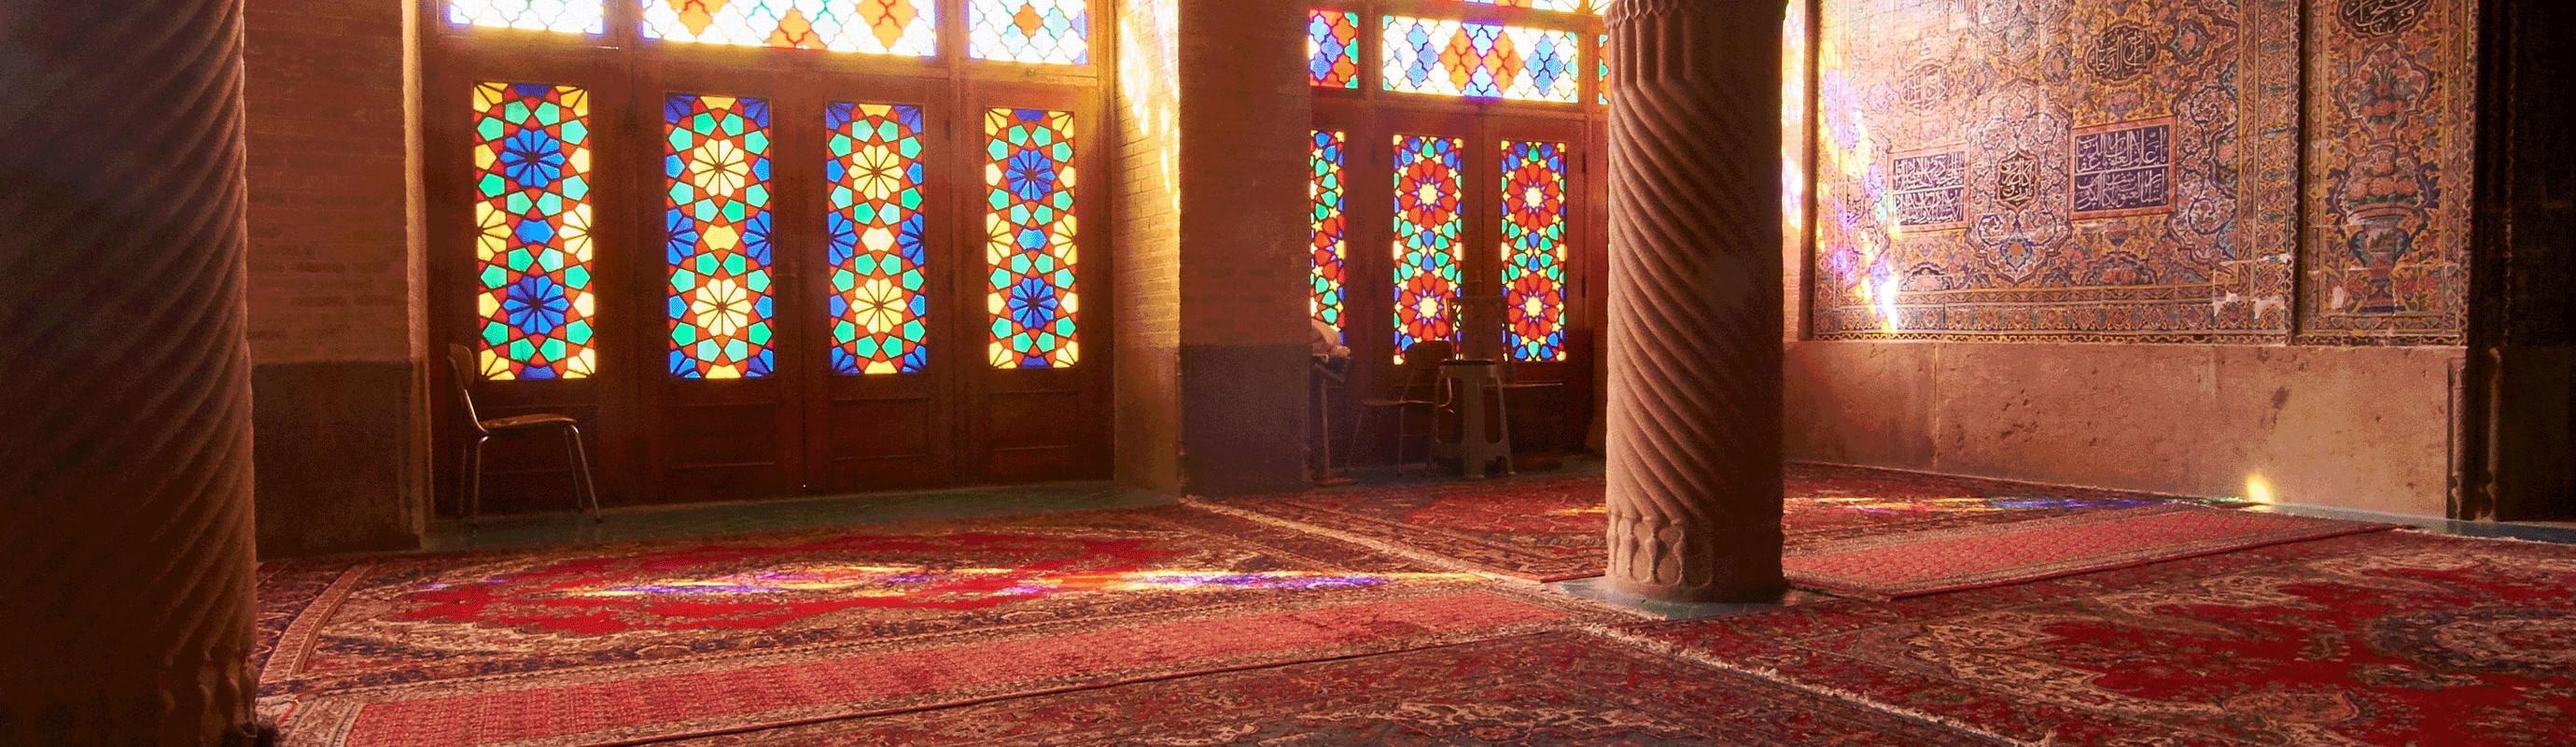 Sermon by Gran Ayatollah Hussain Waheed Khorasani - (Farsi).